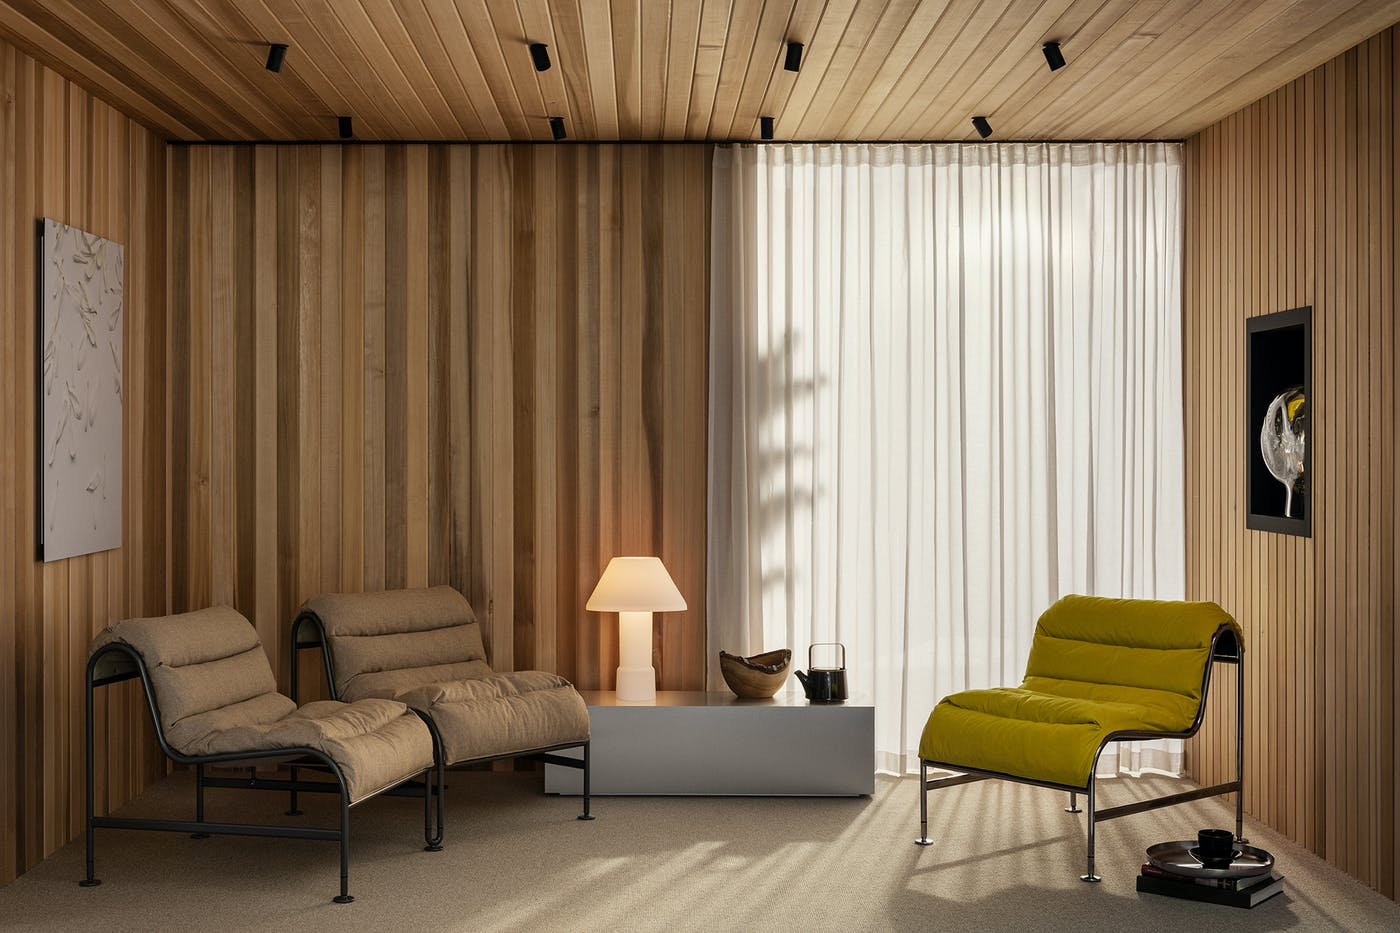 Lammhults Sunny easychair Gunilla Allard Note Design Studio